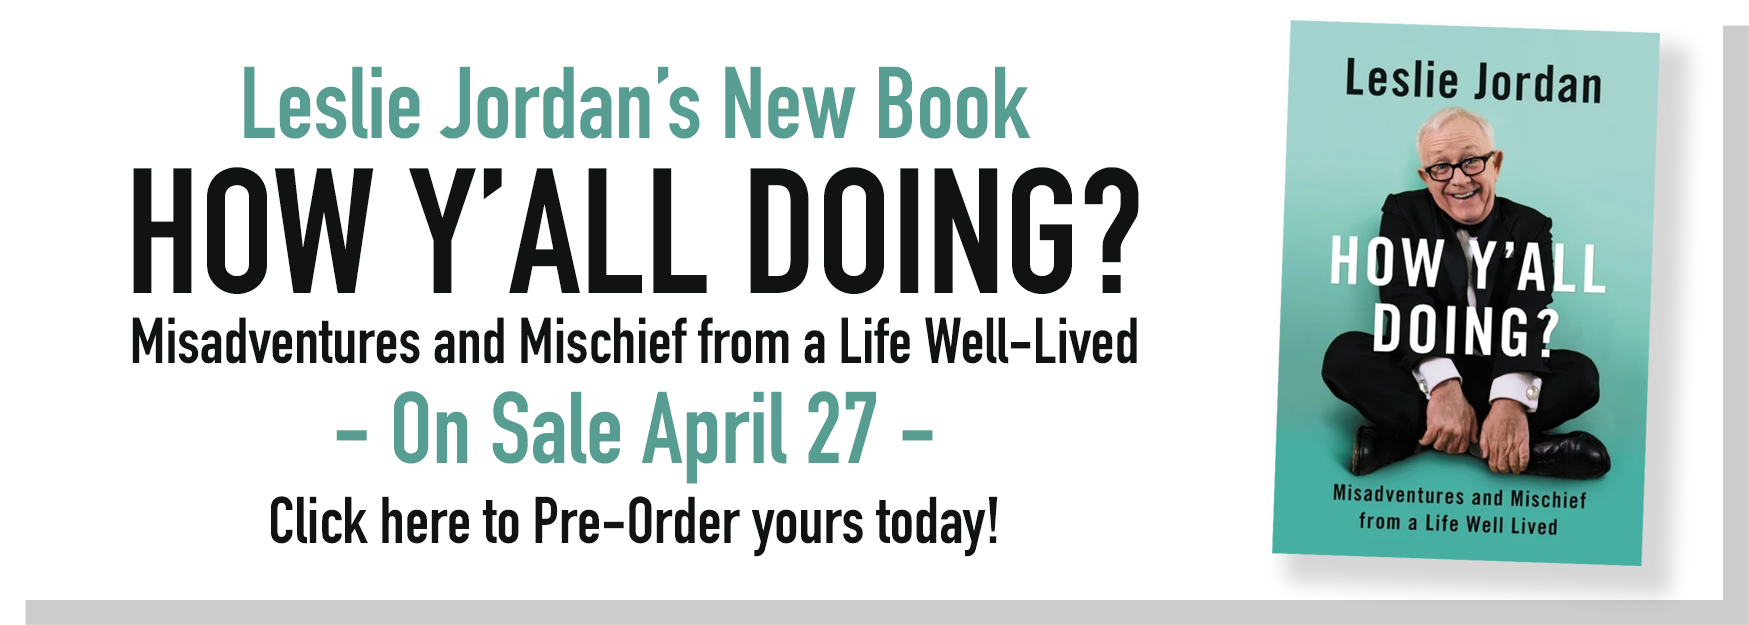 Leslie Jordan's Book 'How Y'all Doing?'